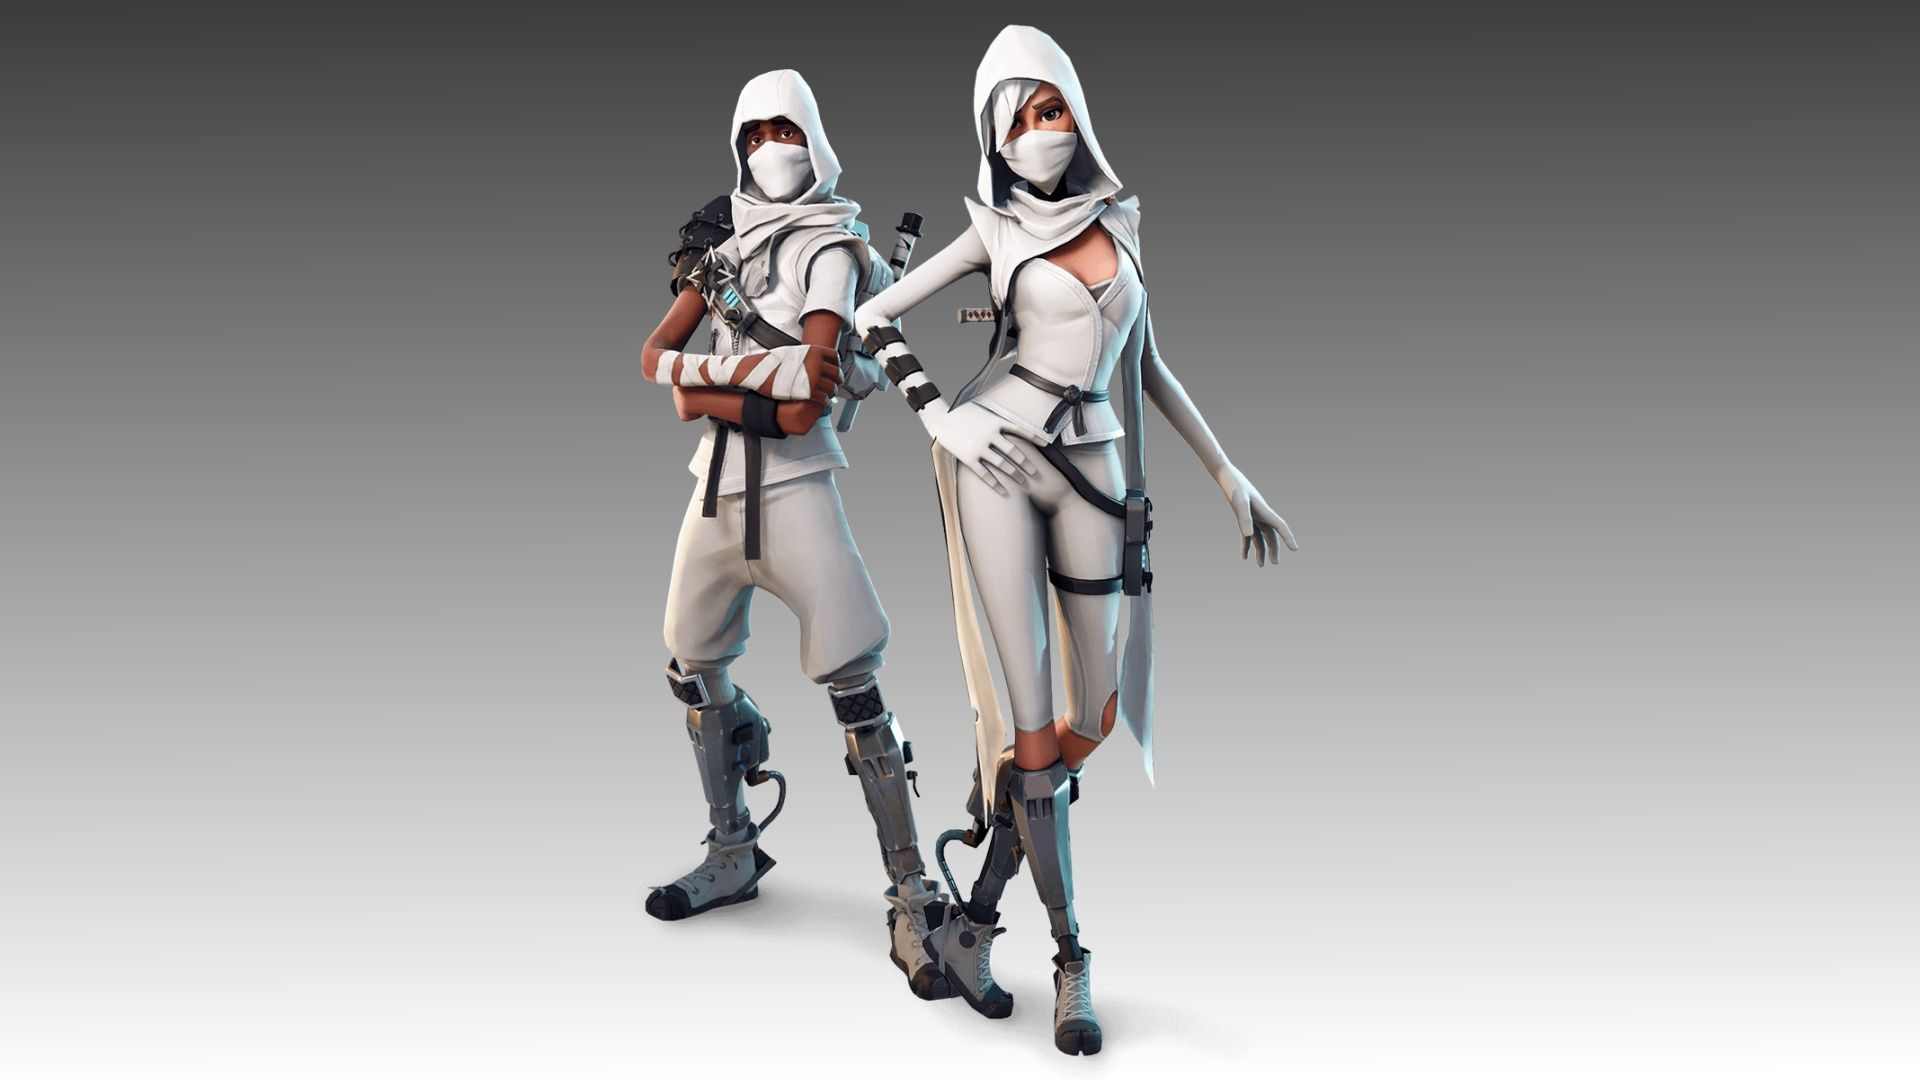 Ninjas From Fortnite Wallpapers Top Free Ninjas From Fortnite